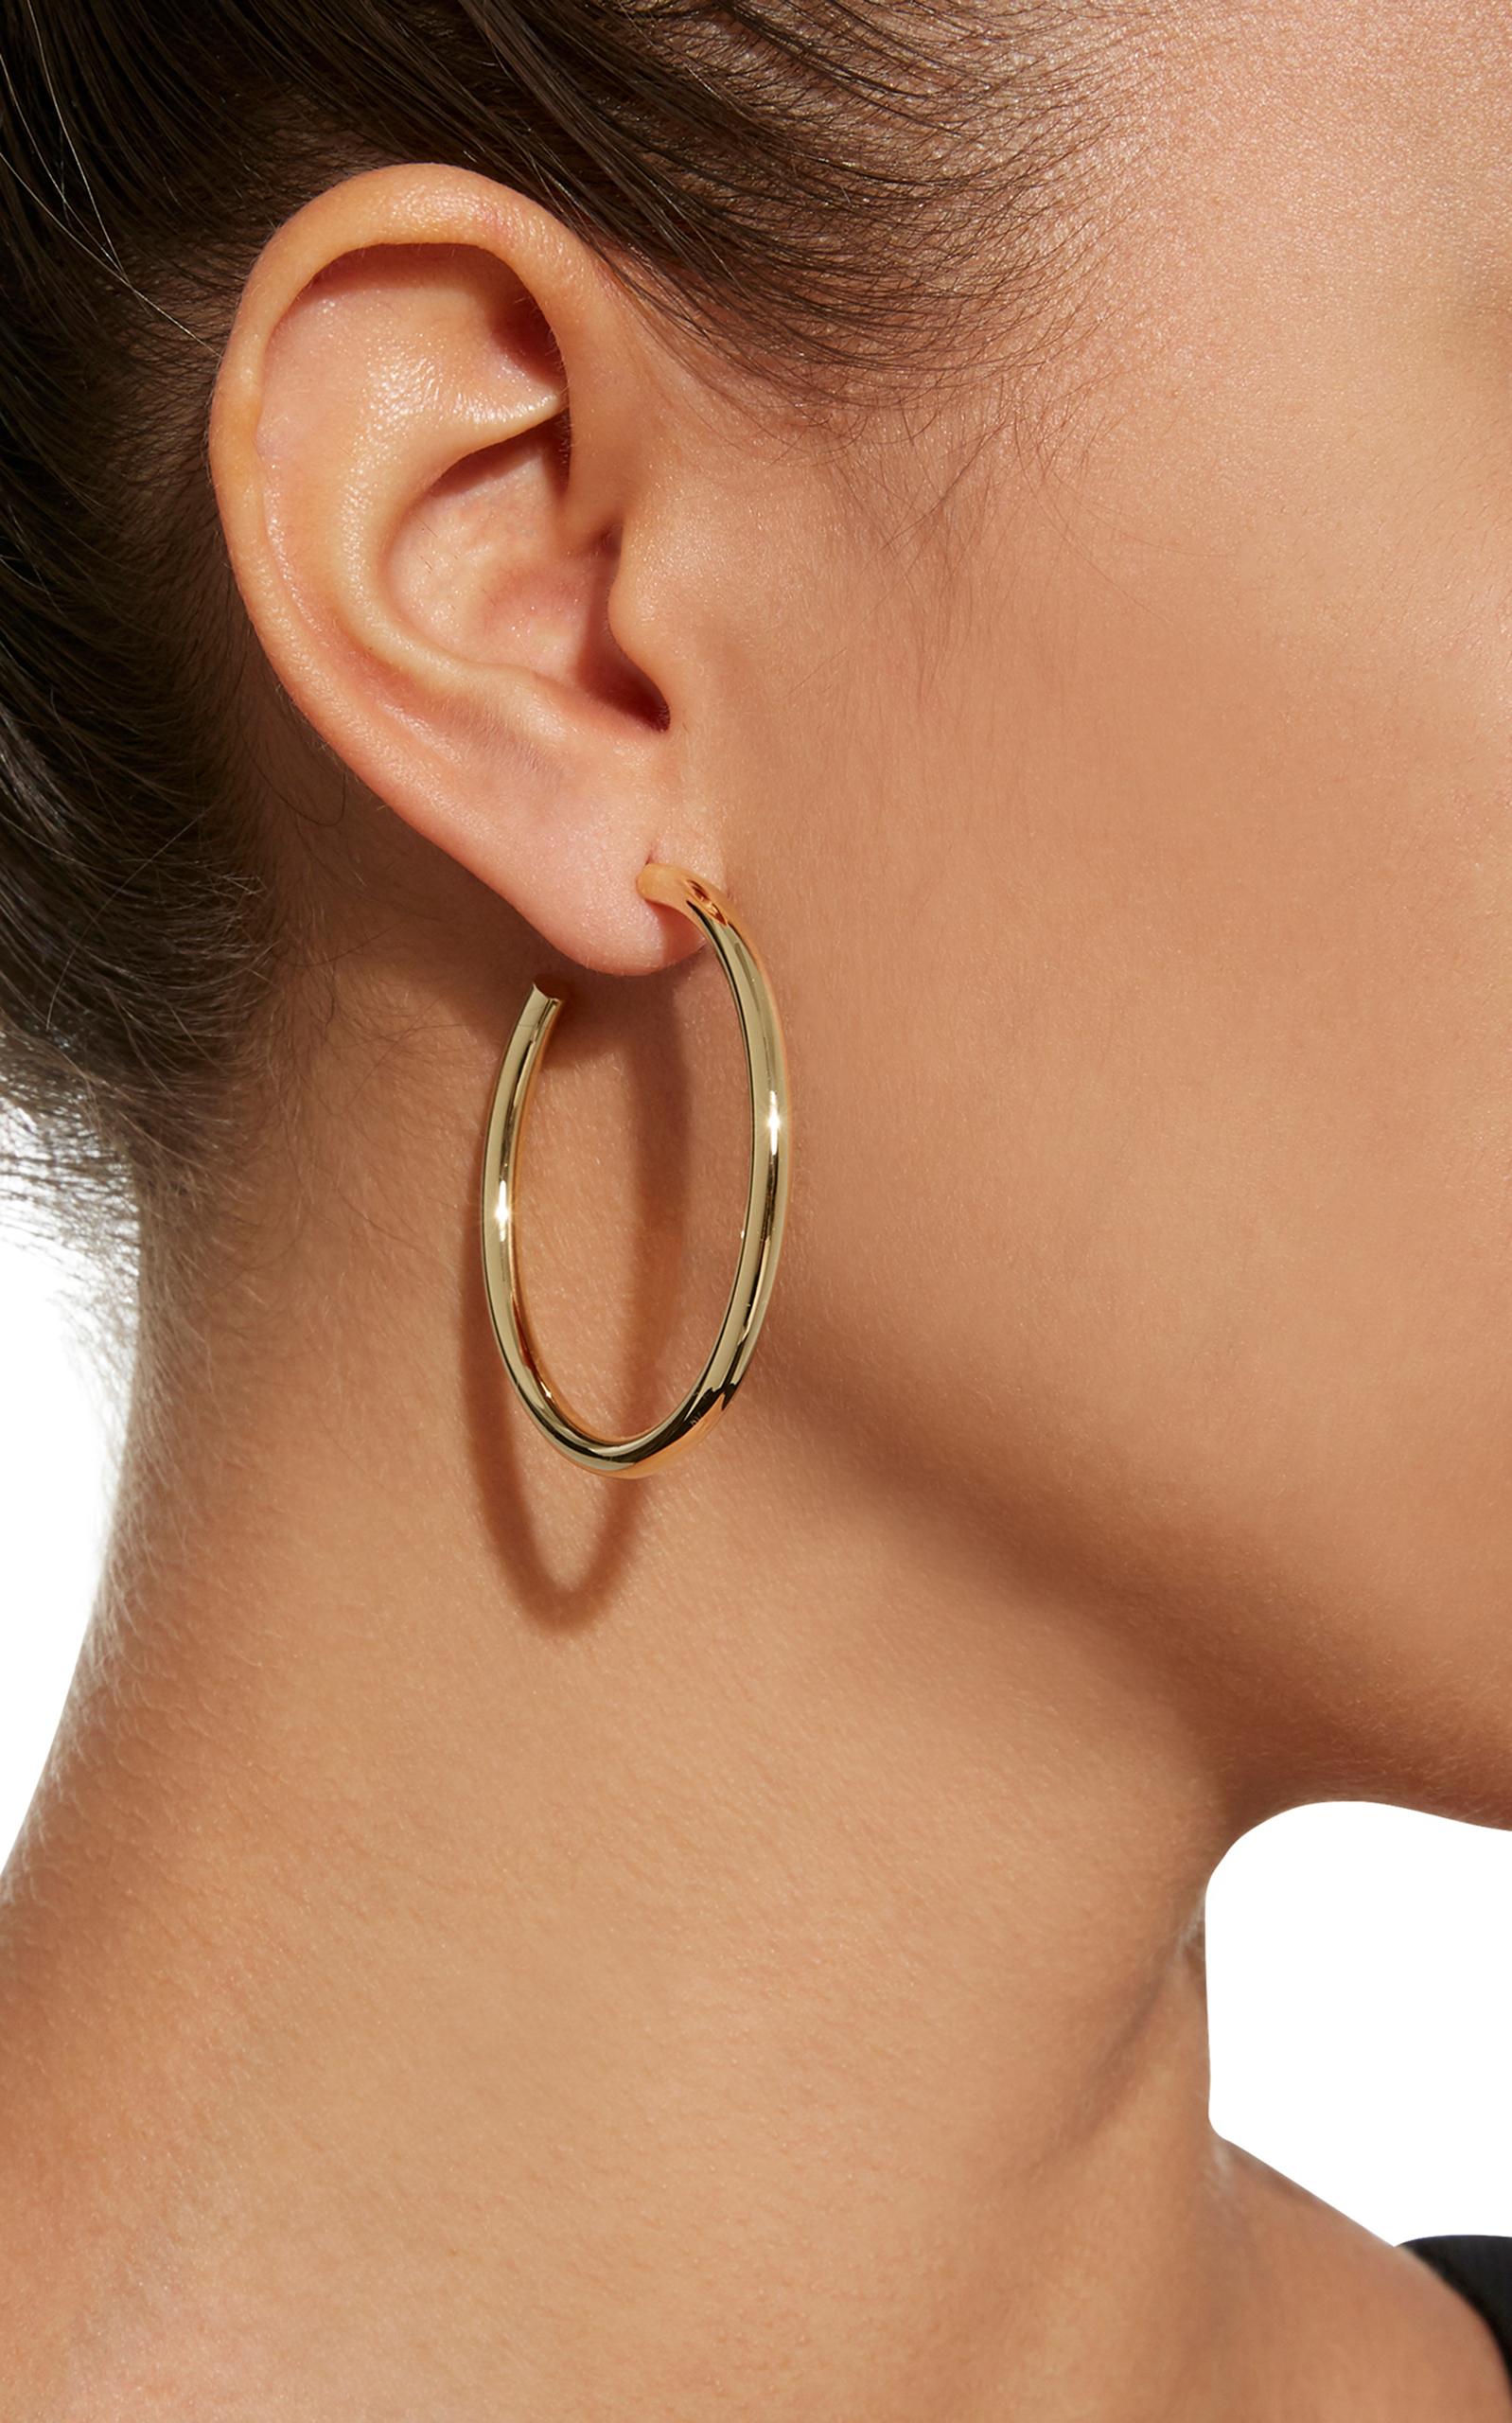 1.5 Baby Gold-Plated Hoop Earrings Jennifer Fisher zo615O72